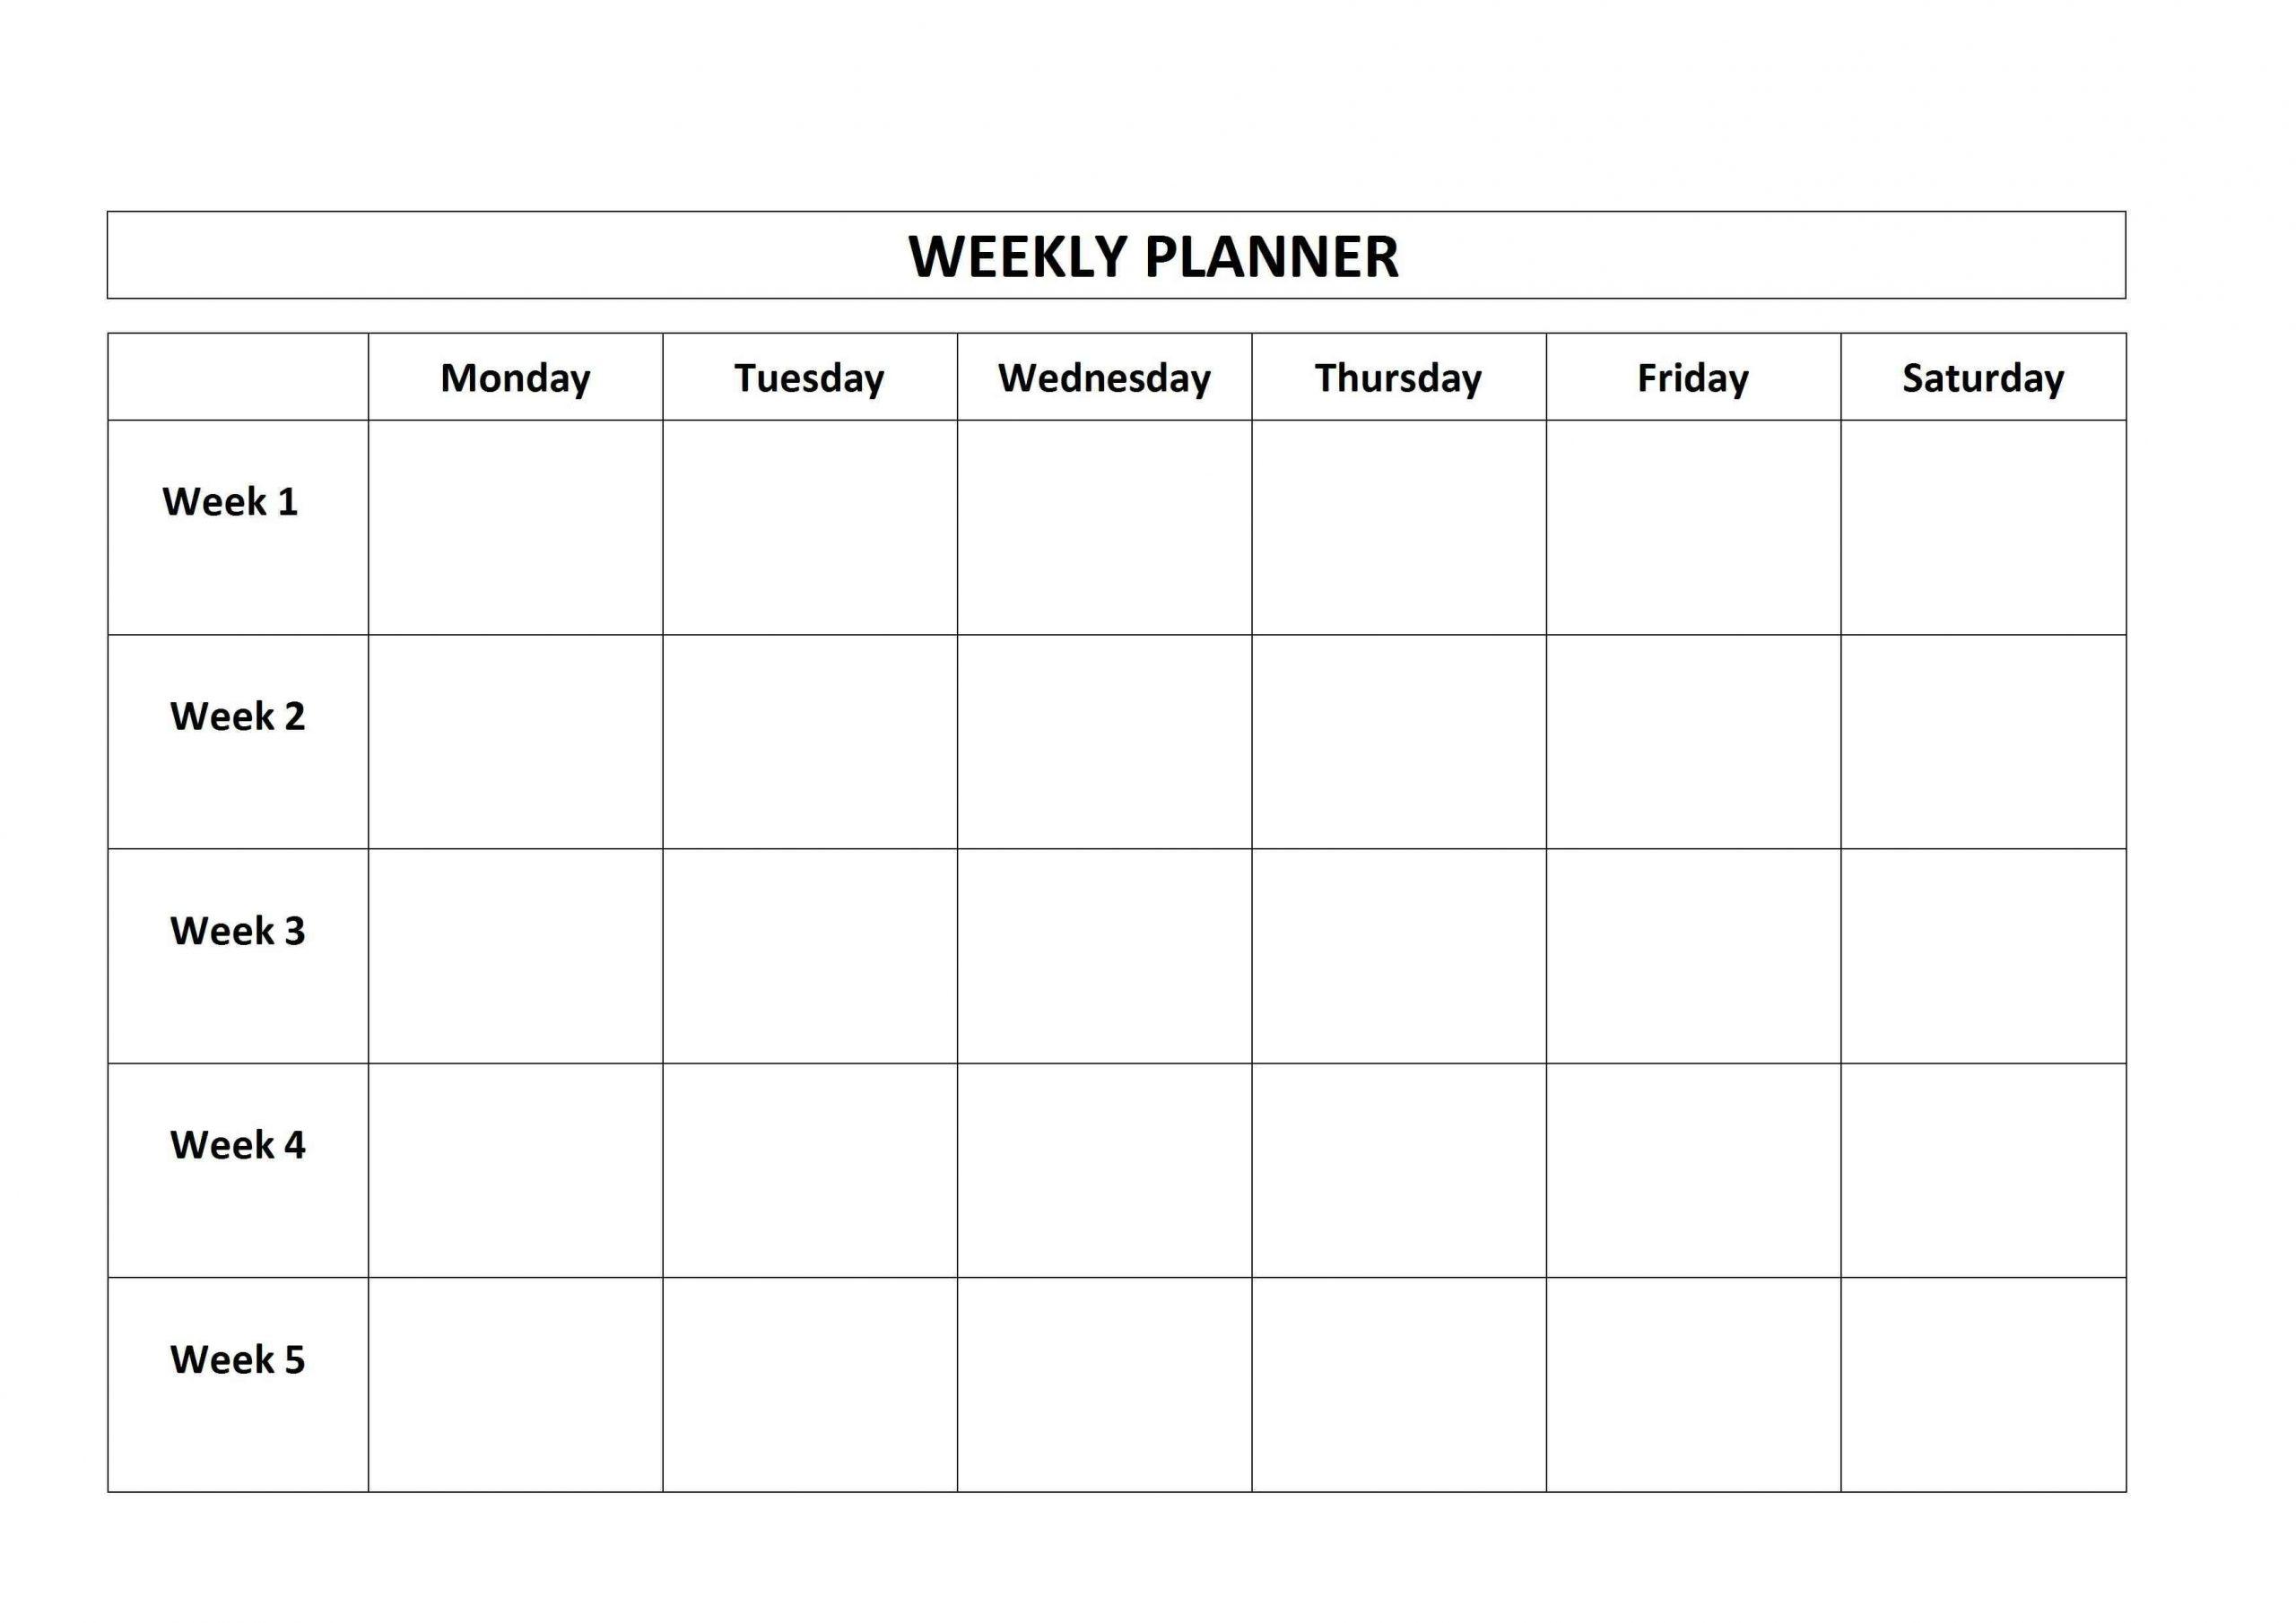 Template Monday To Friday   Calendar Template Printable